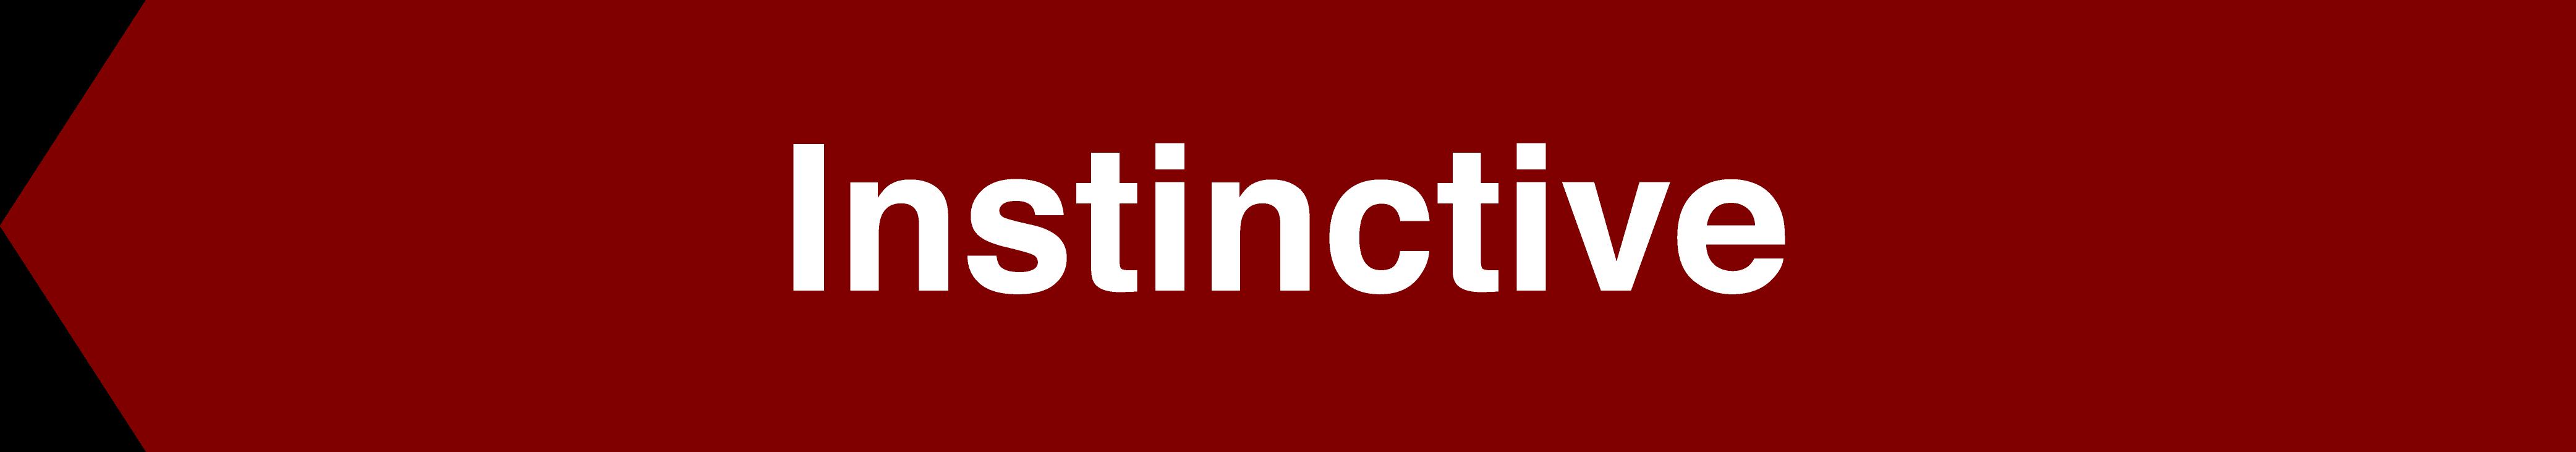 Instinctive